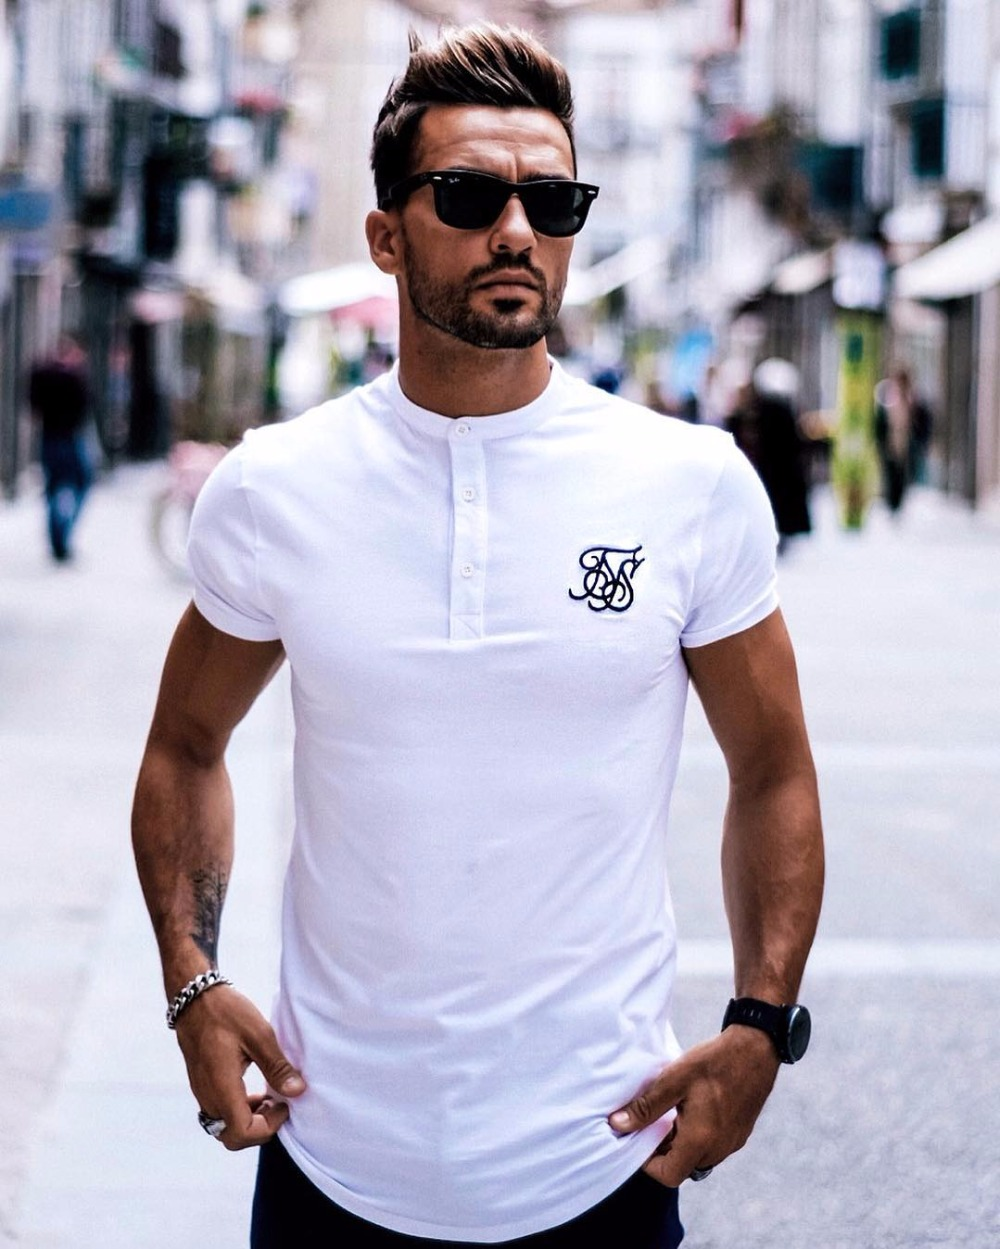 New Men Brand Fashion Summer Kanye West Sik Silk Men Casual Hip Hop Irregular Cut Button Short Sleeved T-shirt Black White